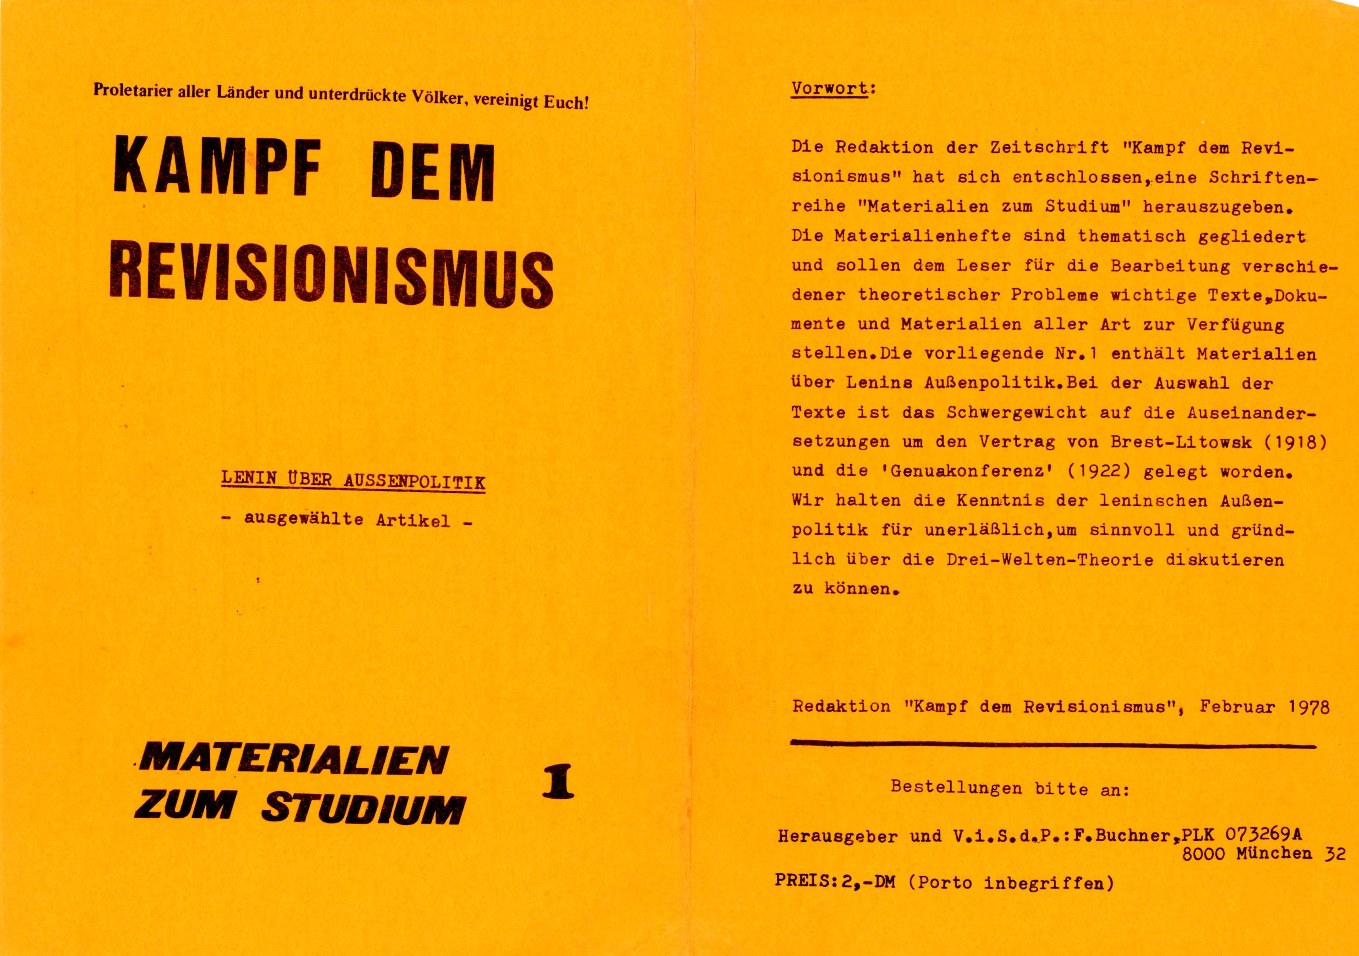 Muenchen_Kampf_dem_Revisionismus_Materialien_1978_01_01